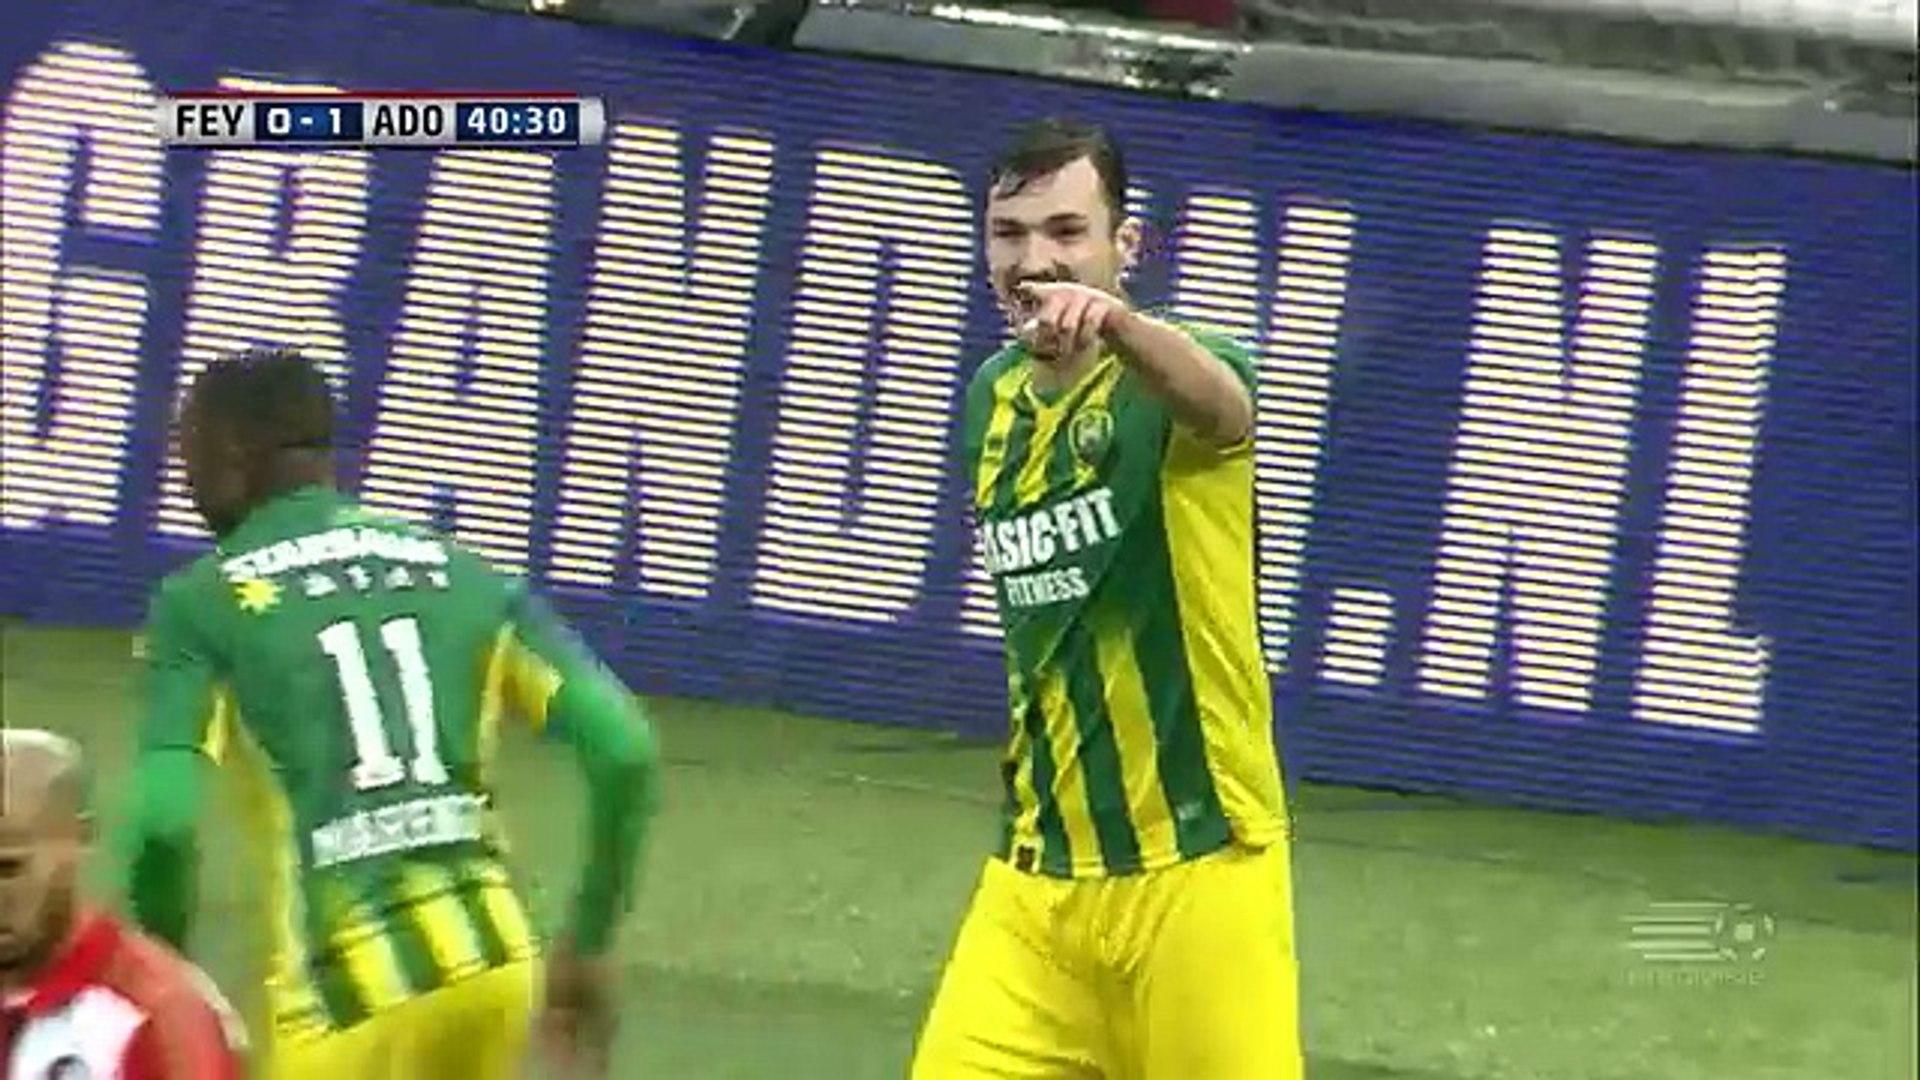 ÖZET: Feyenoord 0-2 ADO